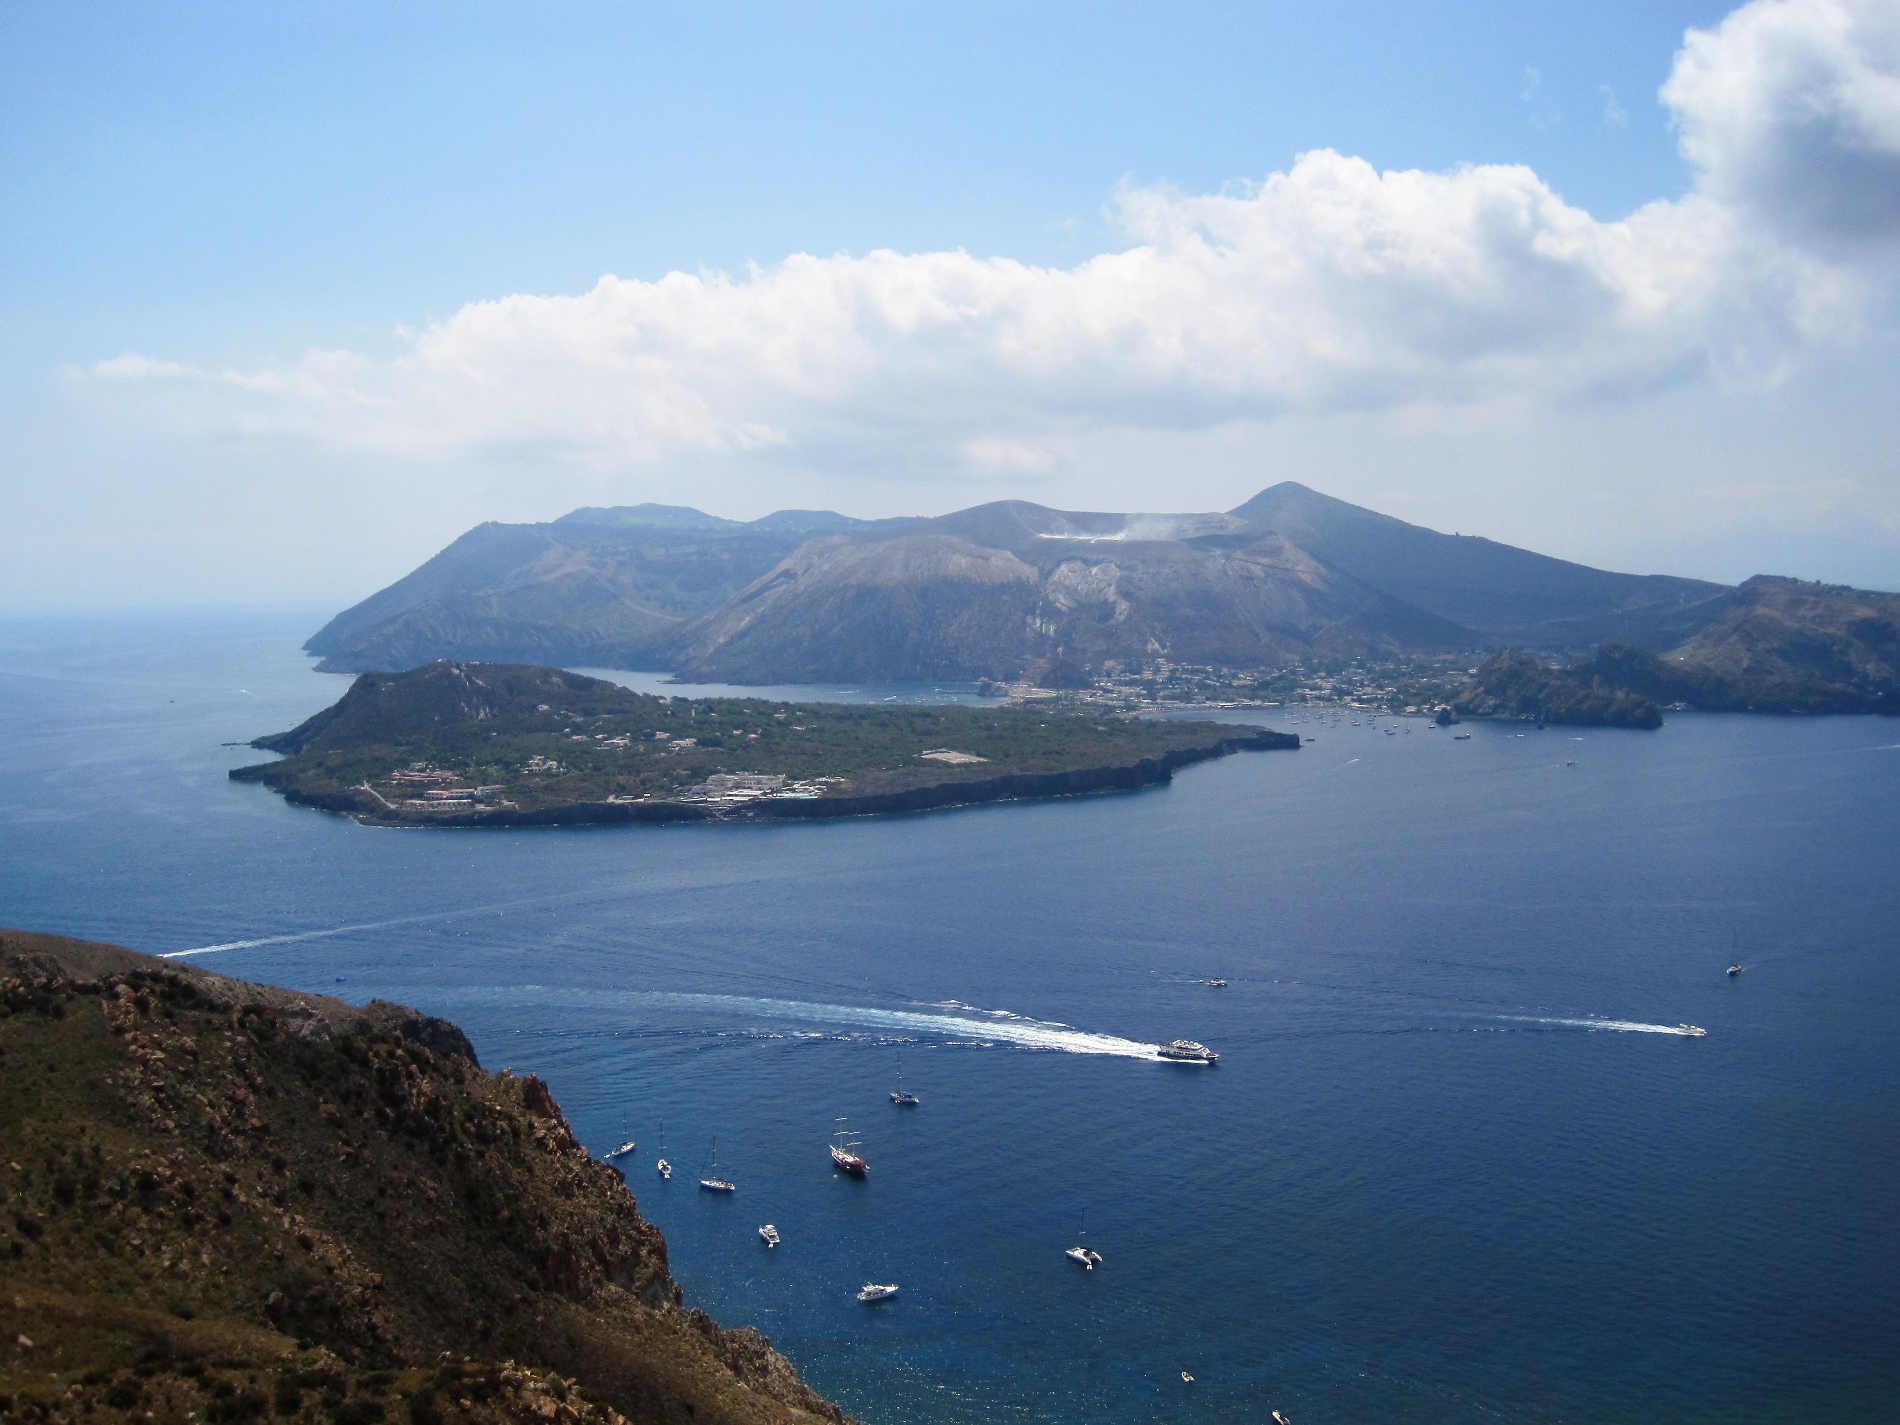 Guida alle 7 Isole Eolie Lipari e Vulcano